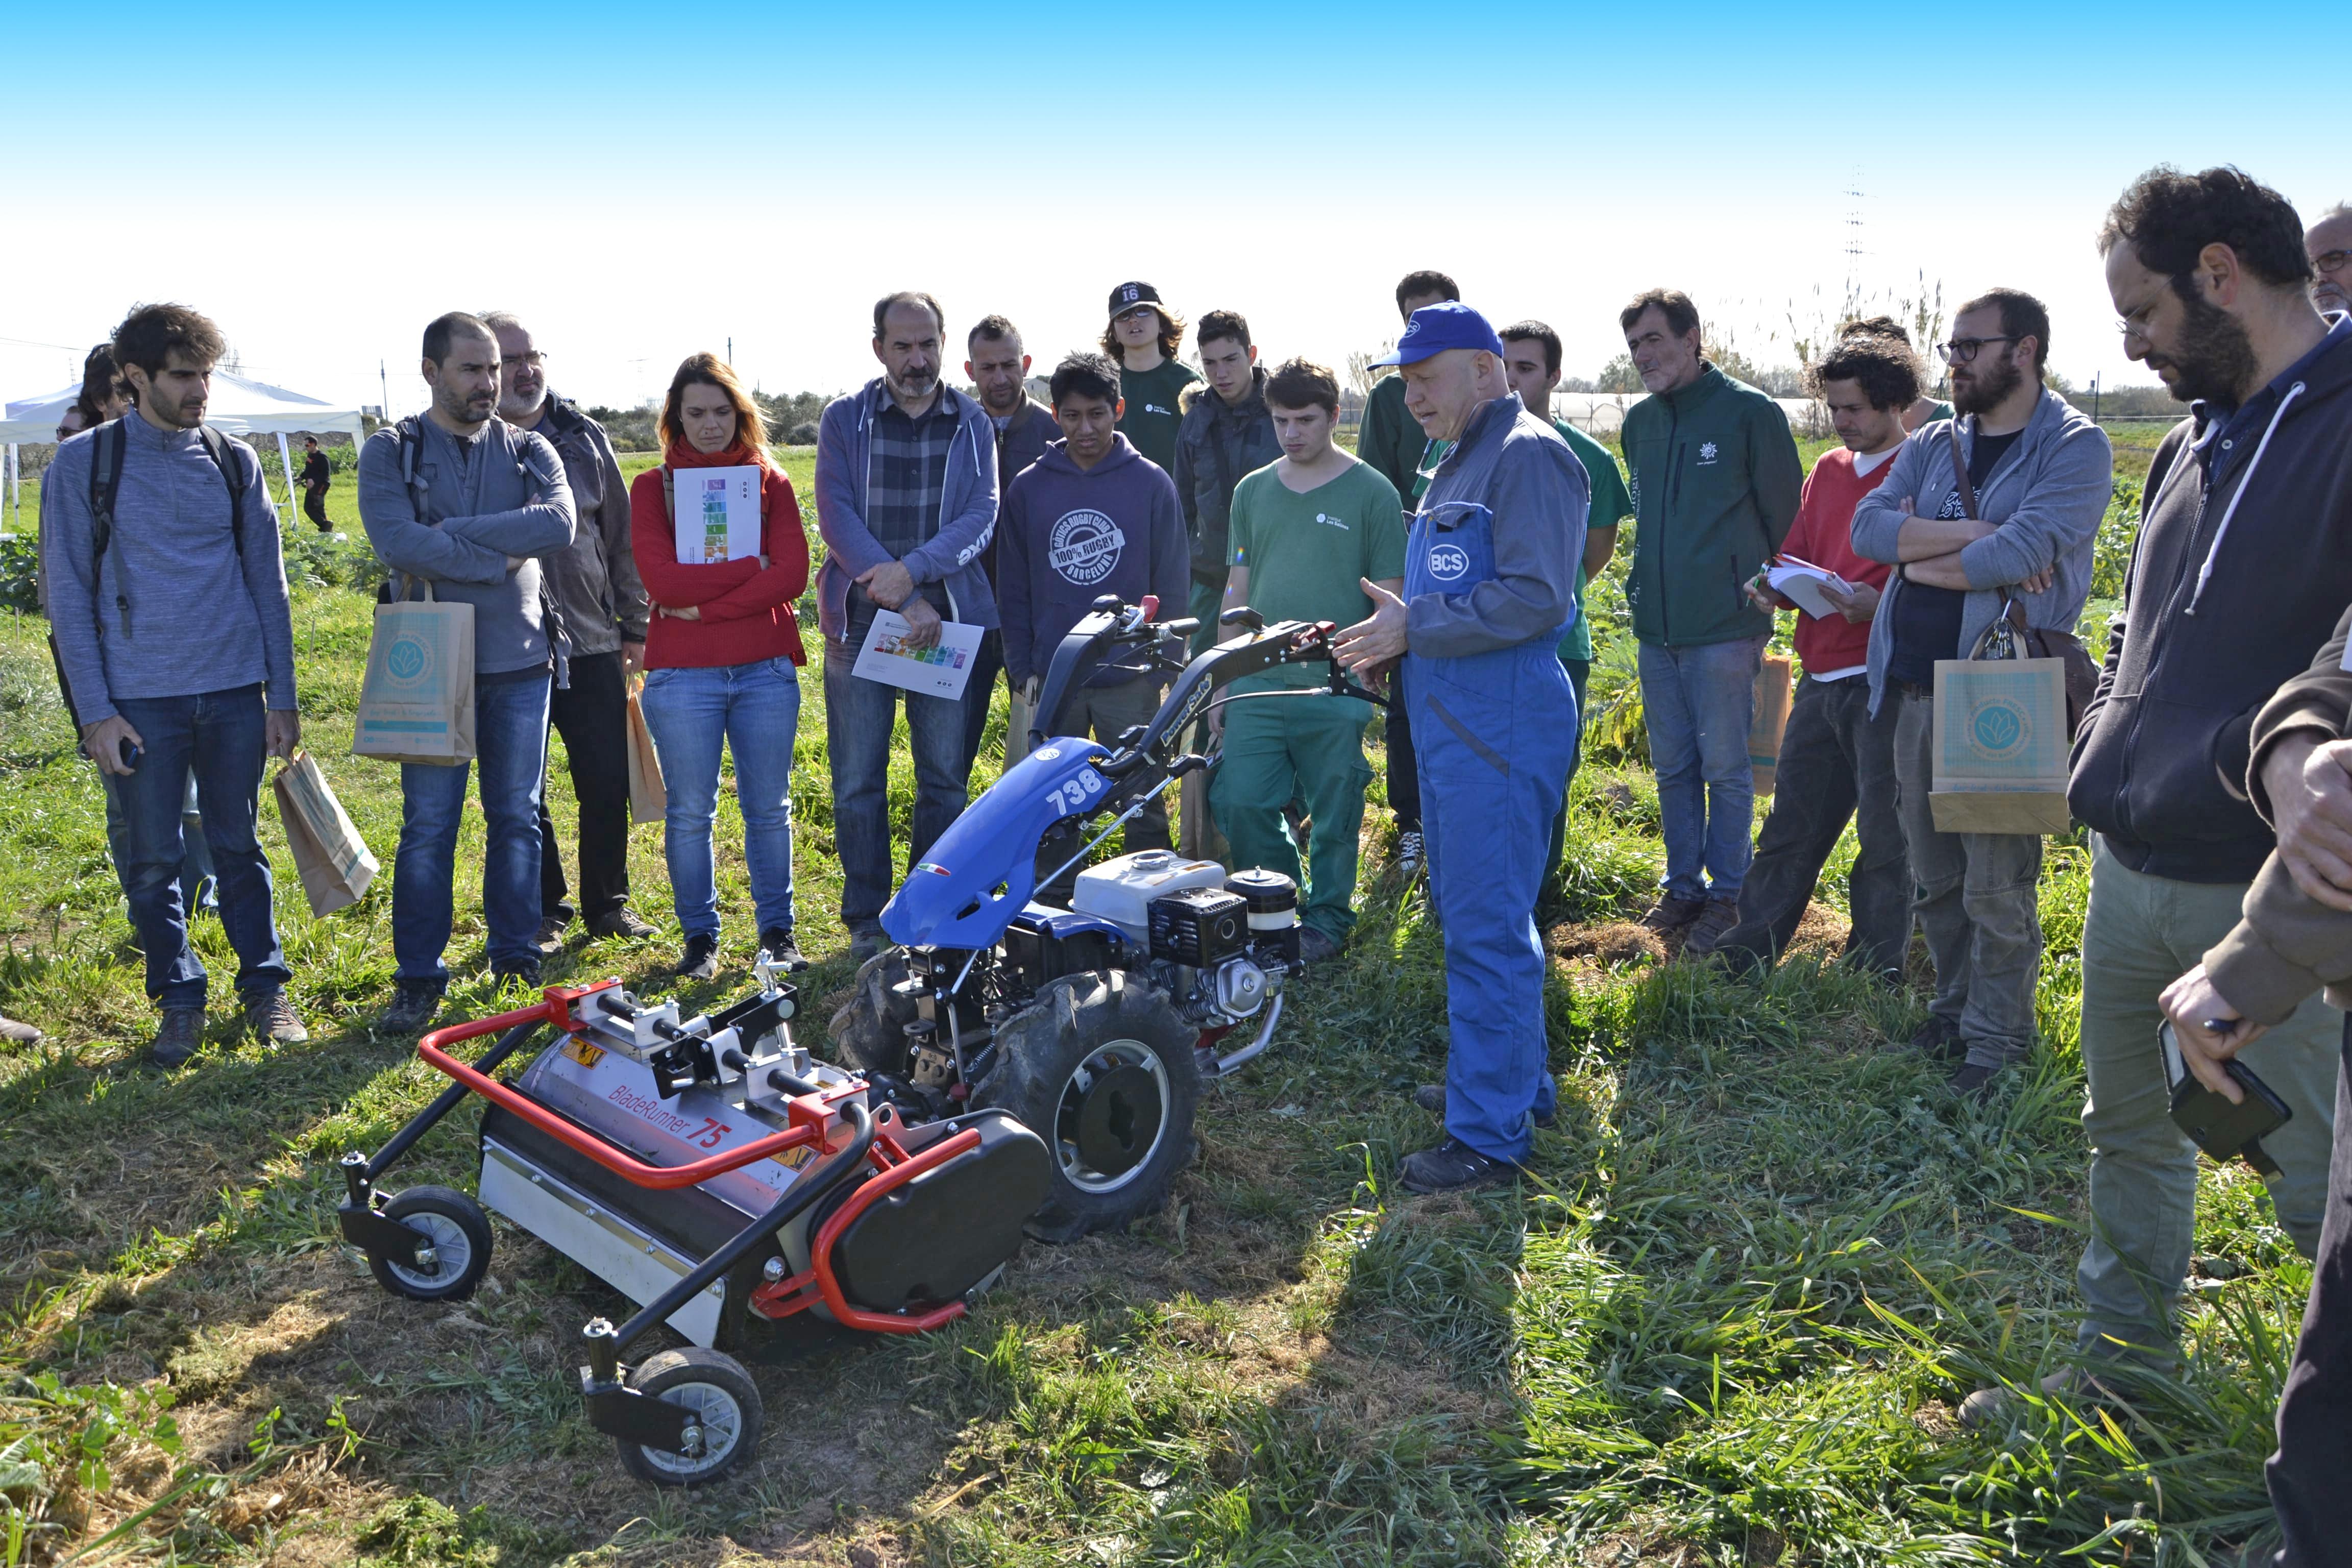 agricultura-ecologica-baix-llobregat-trituradora-bladerunner